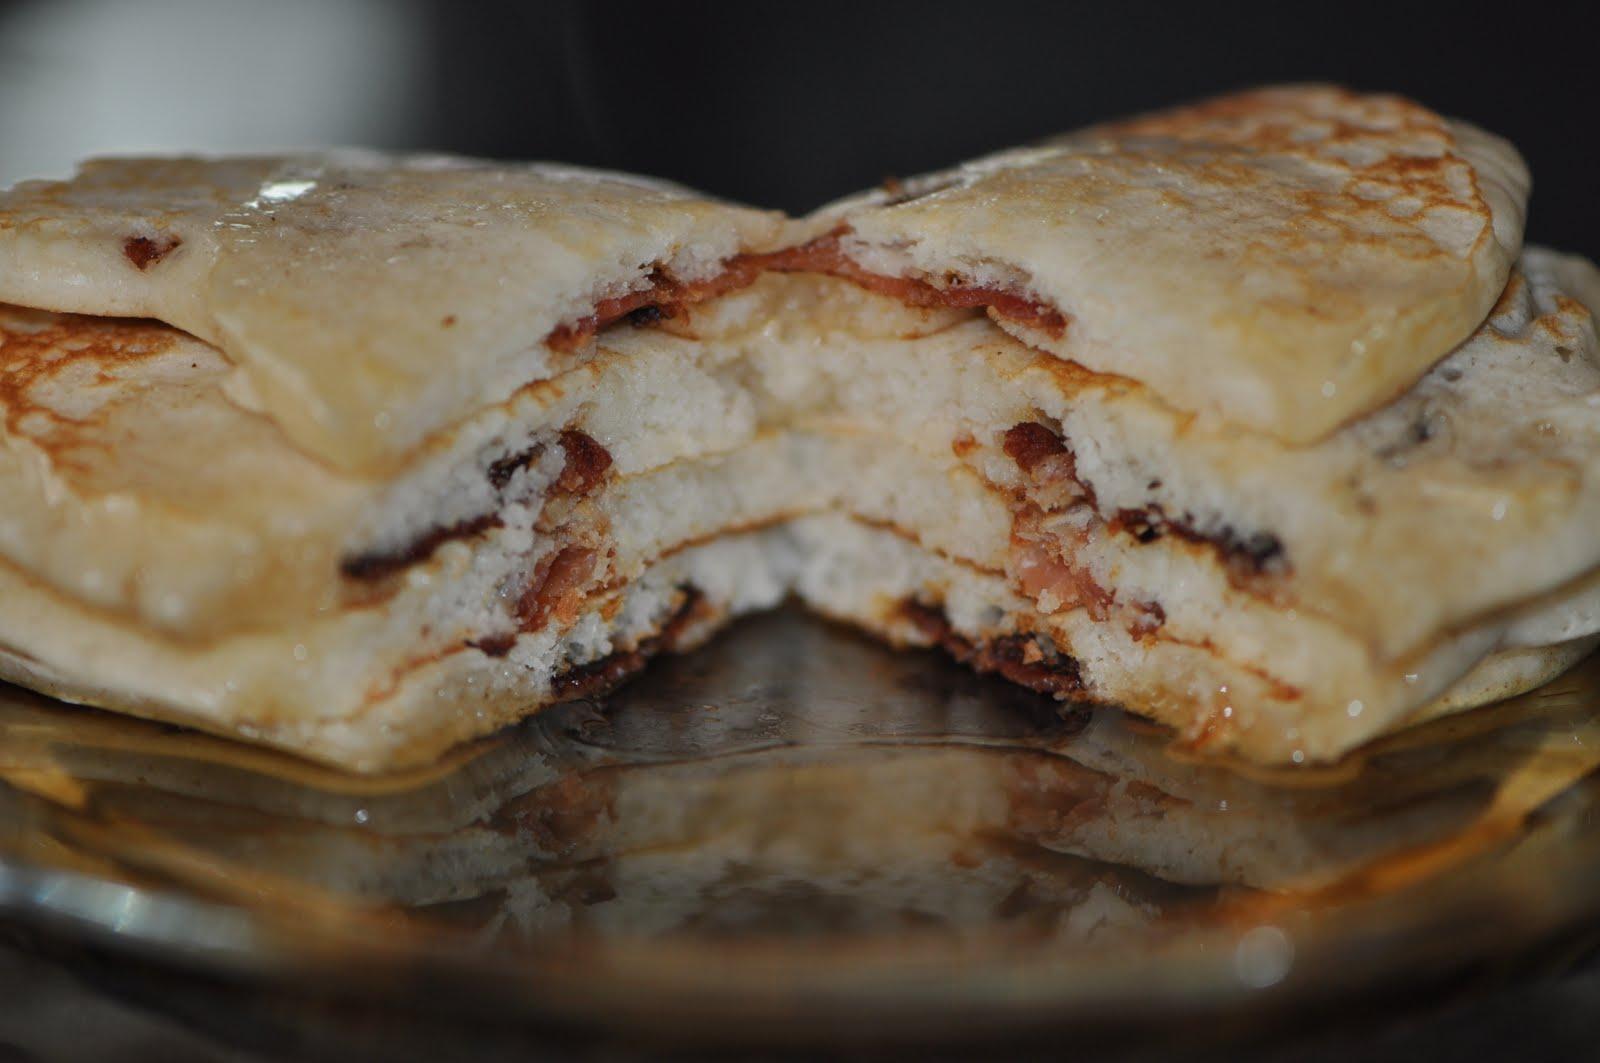 Simple Pleasures: Bacon Filled Pancakes